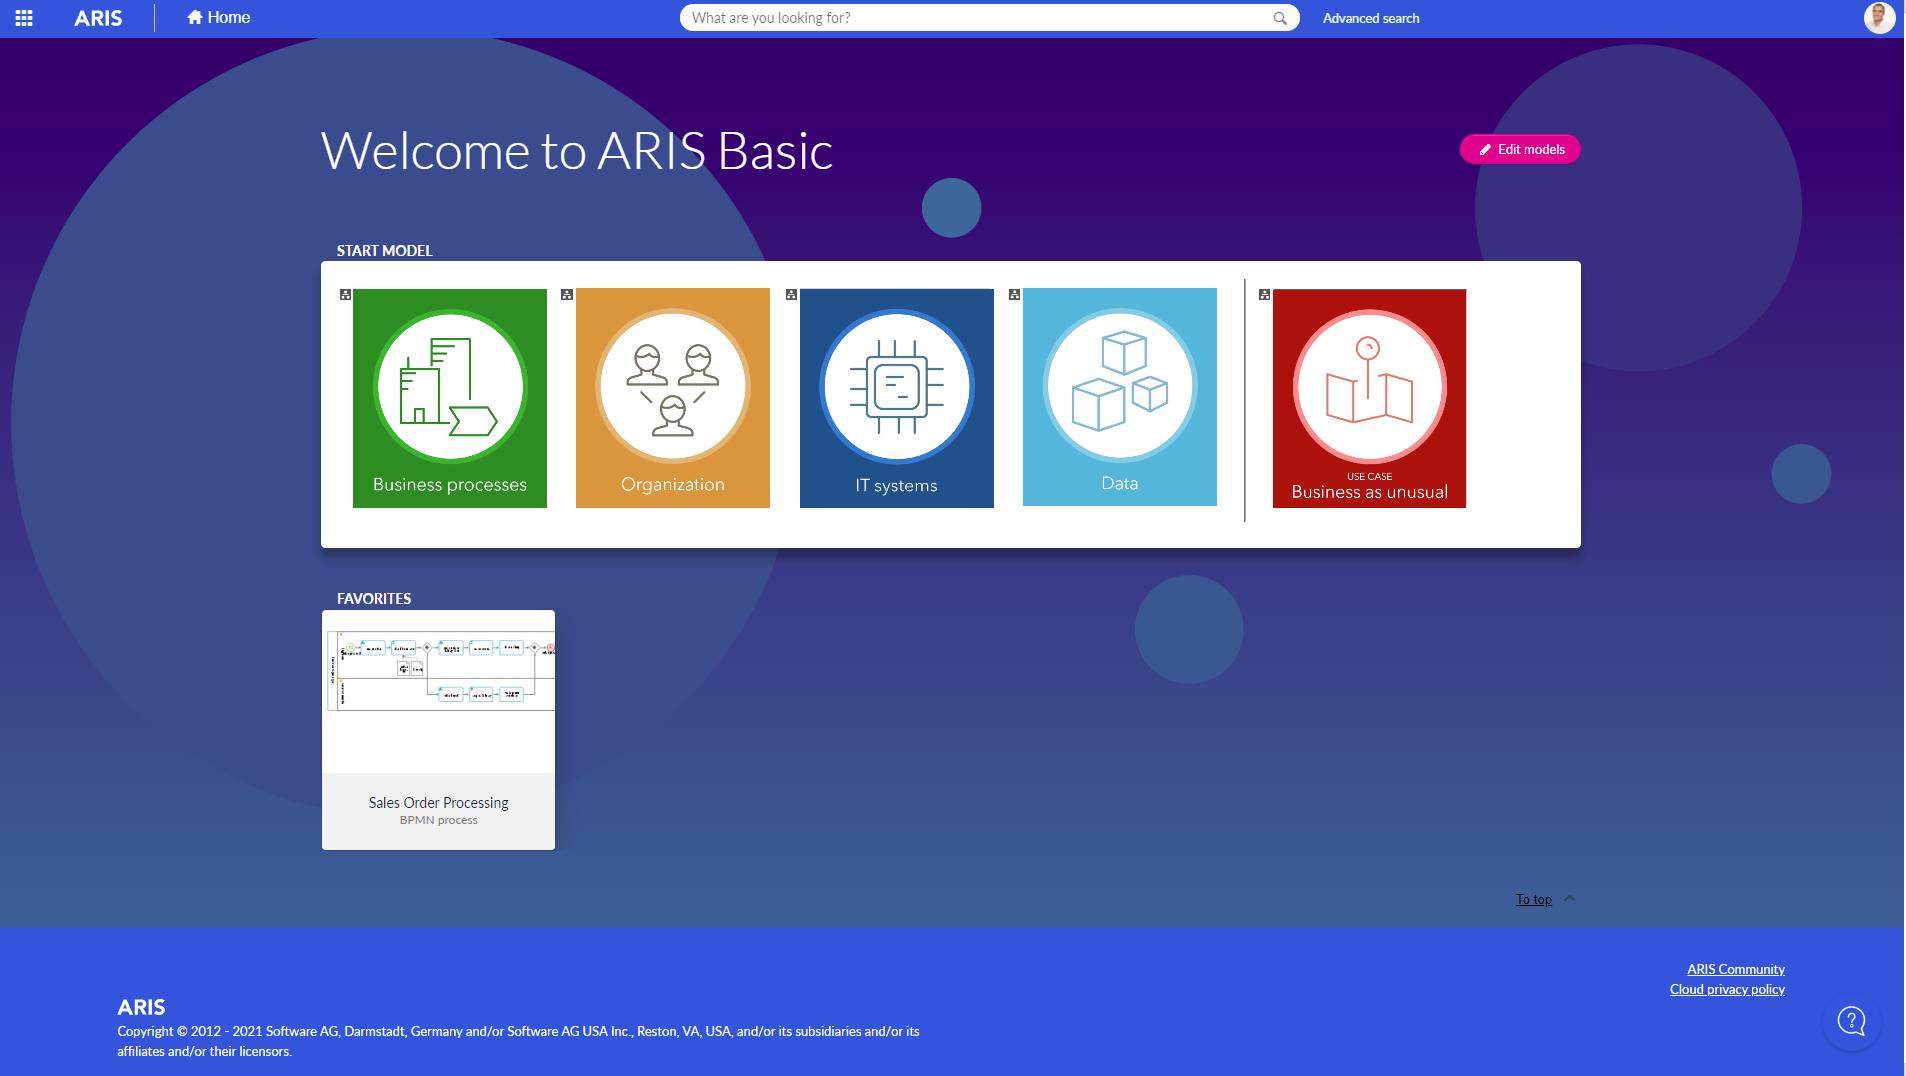 ARIS Basic home screen